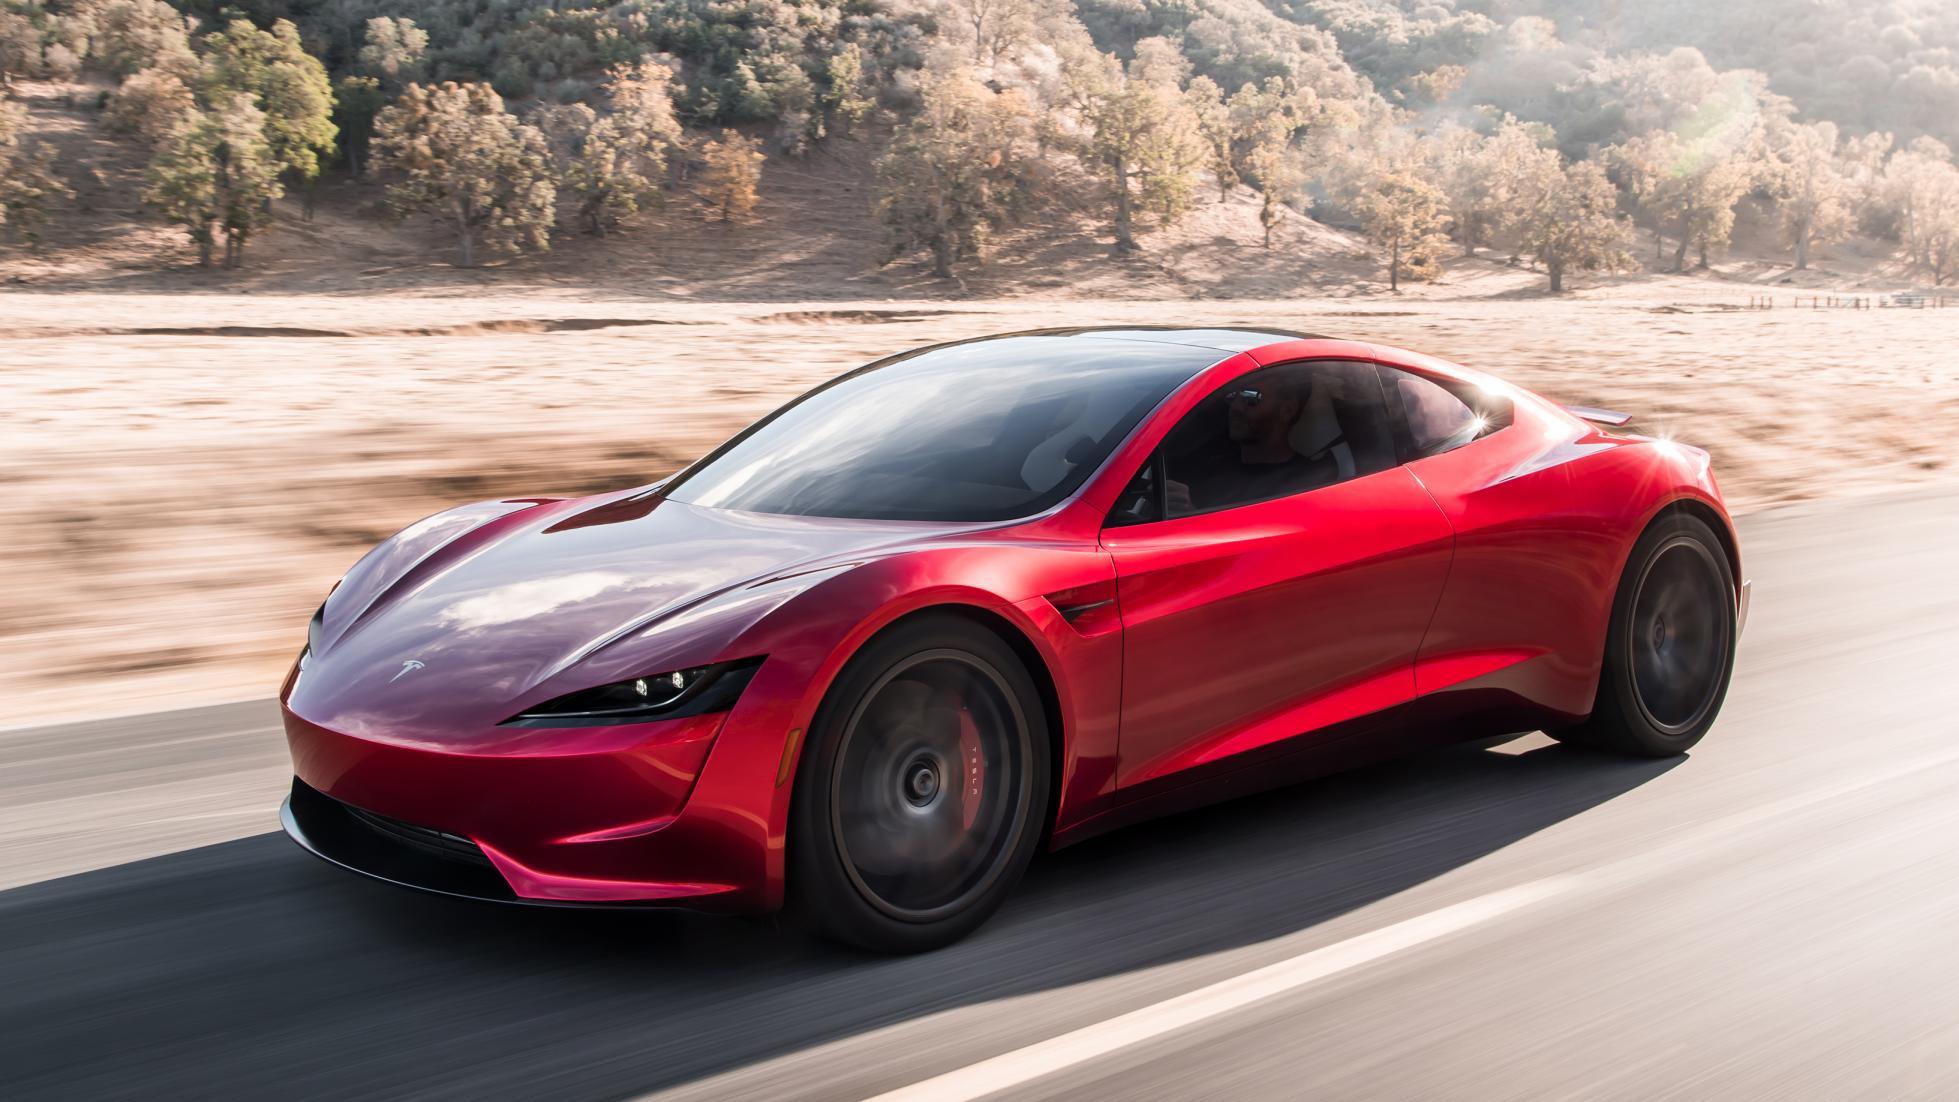 telsa roadster electric car 2020